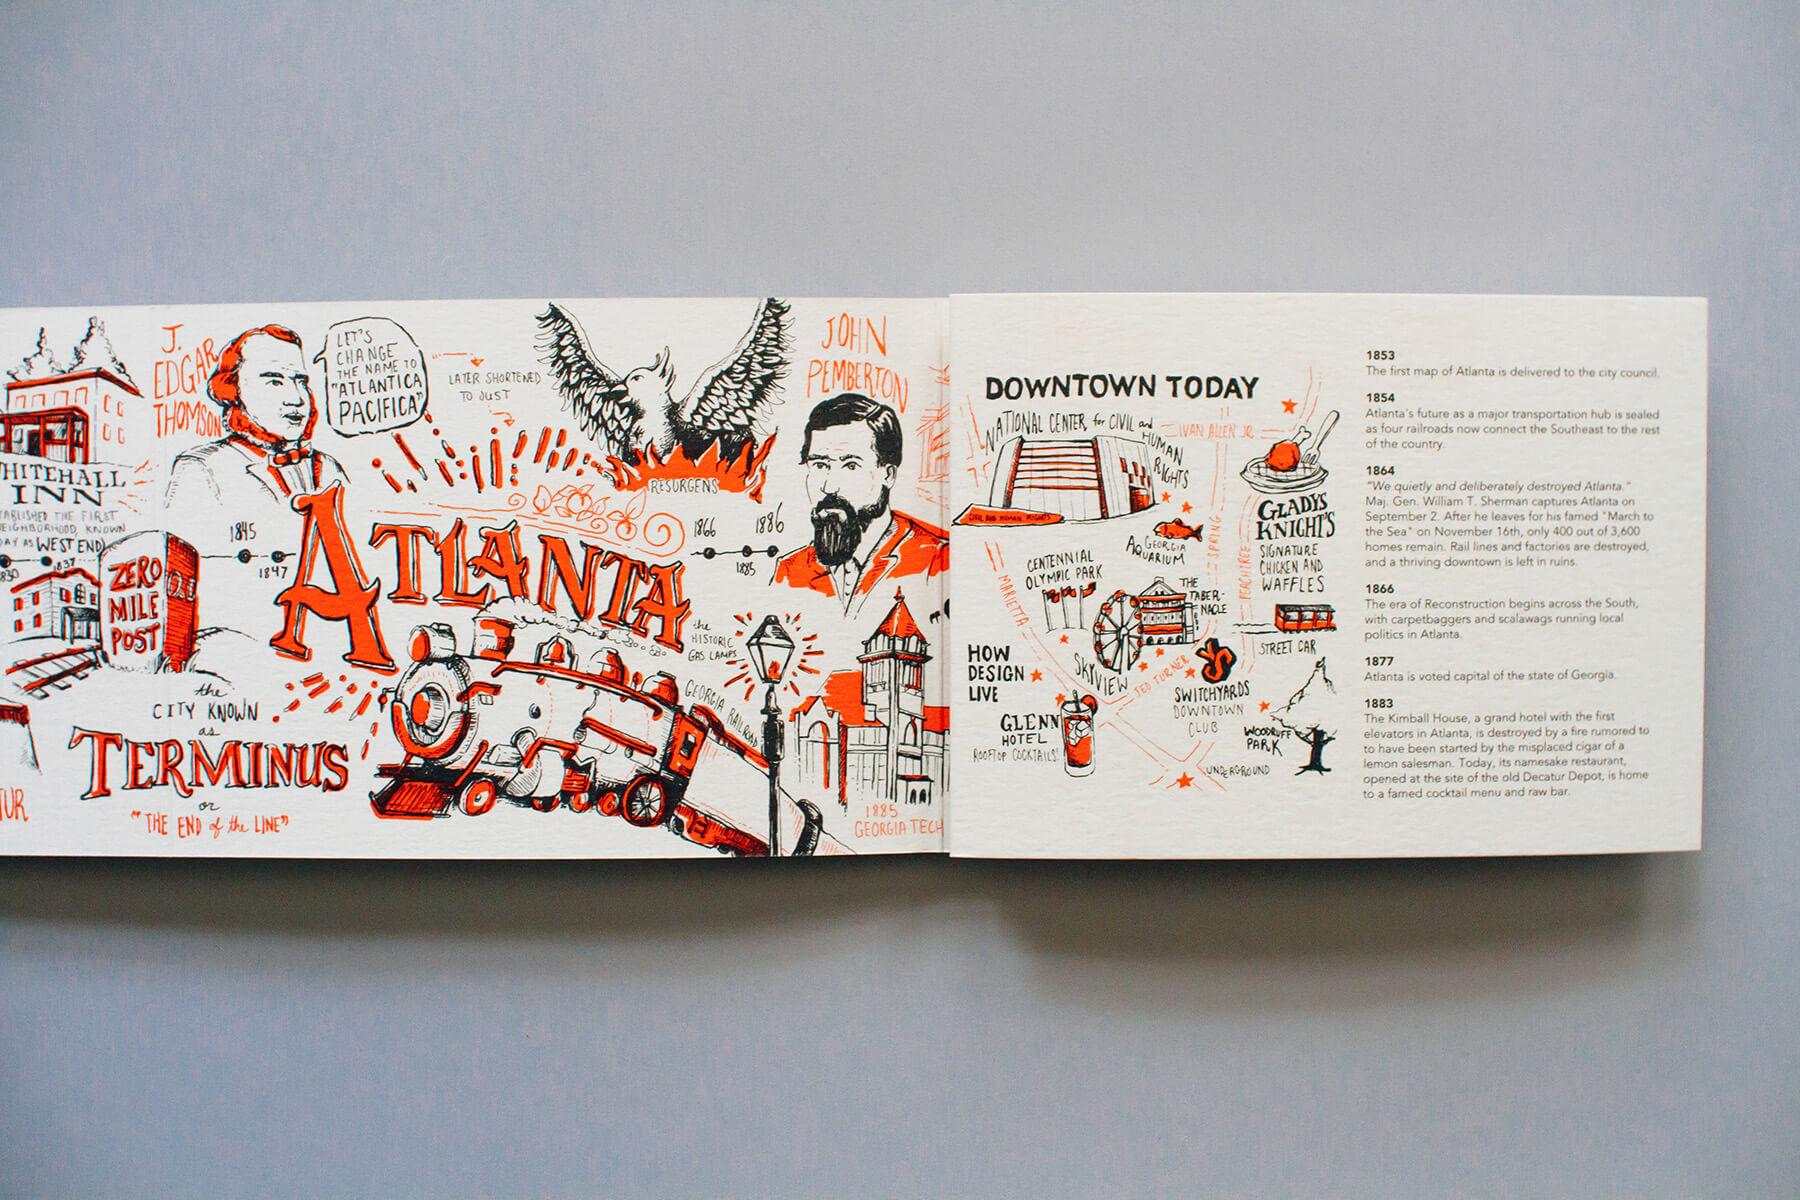 atlanta-illustrated-history-03.jpg